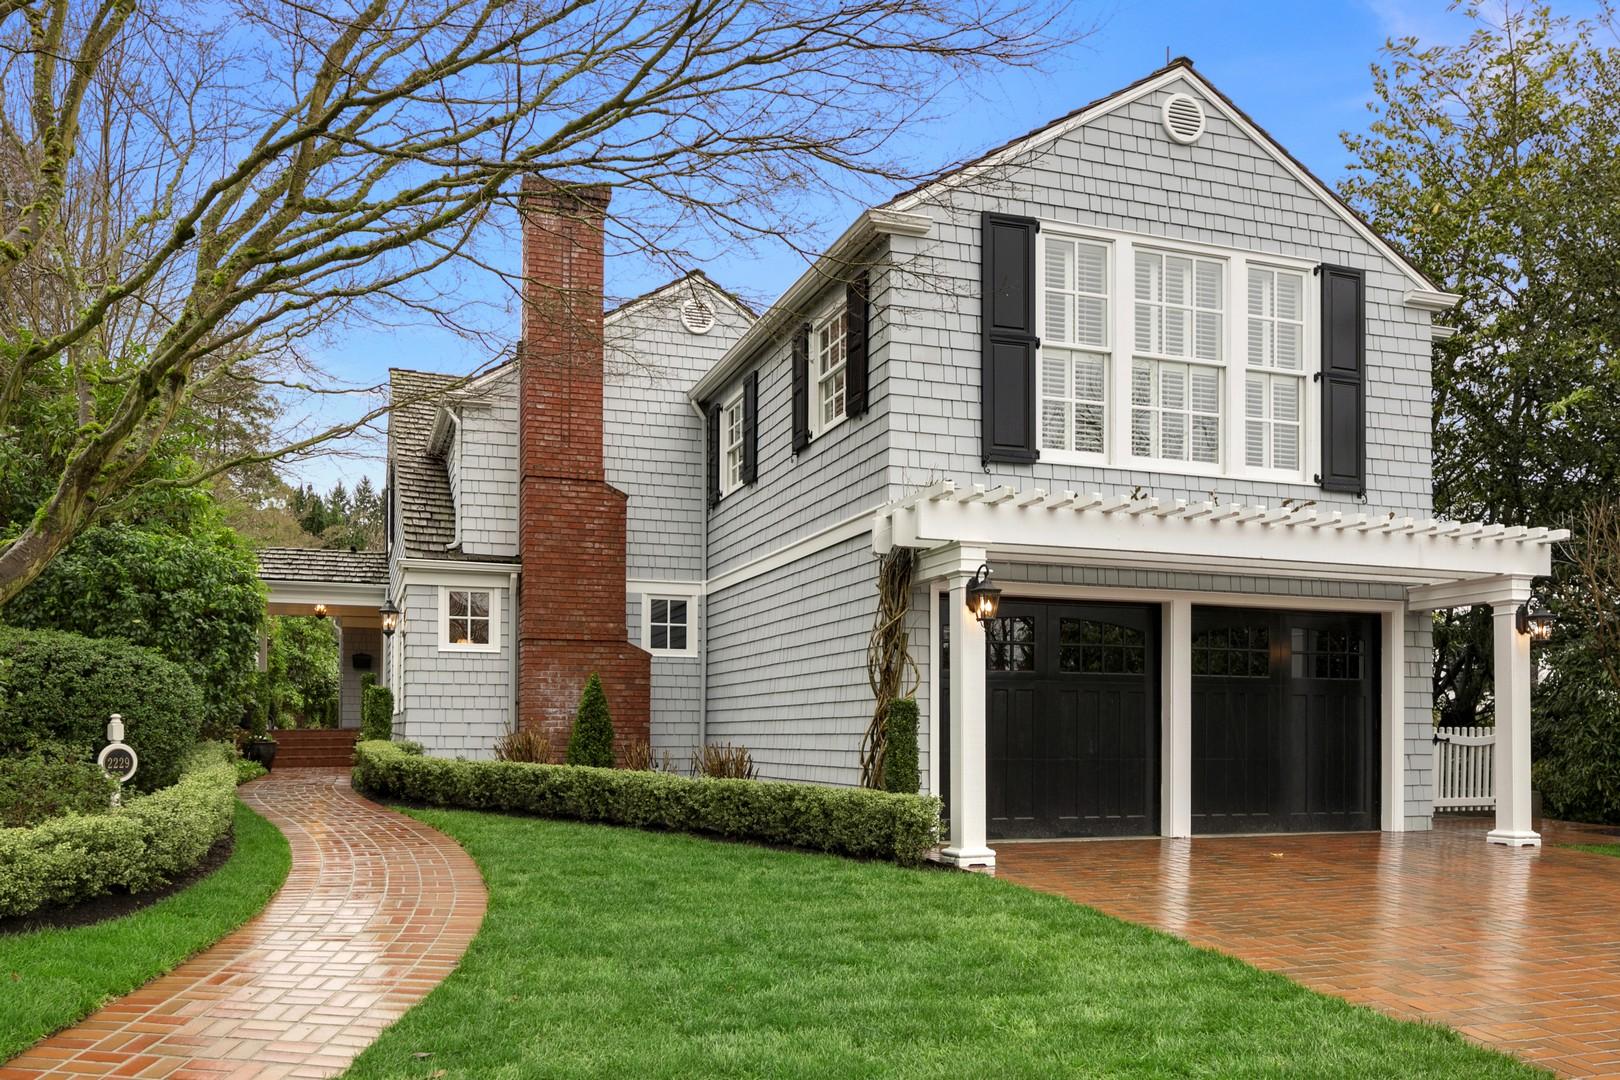 独户住宅 为 销售 在 Charm in Broadmoor 2229 Waverly Wy E Broadmoor, 西雅图, 华盛顿州, 98112 美国